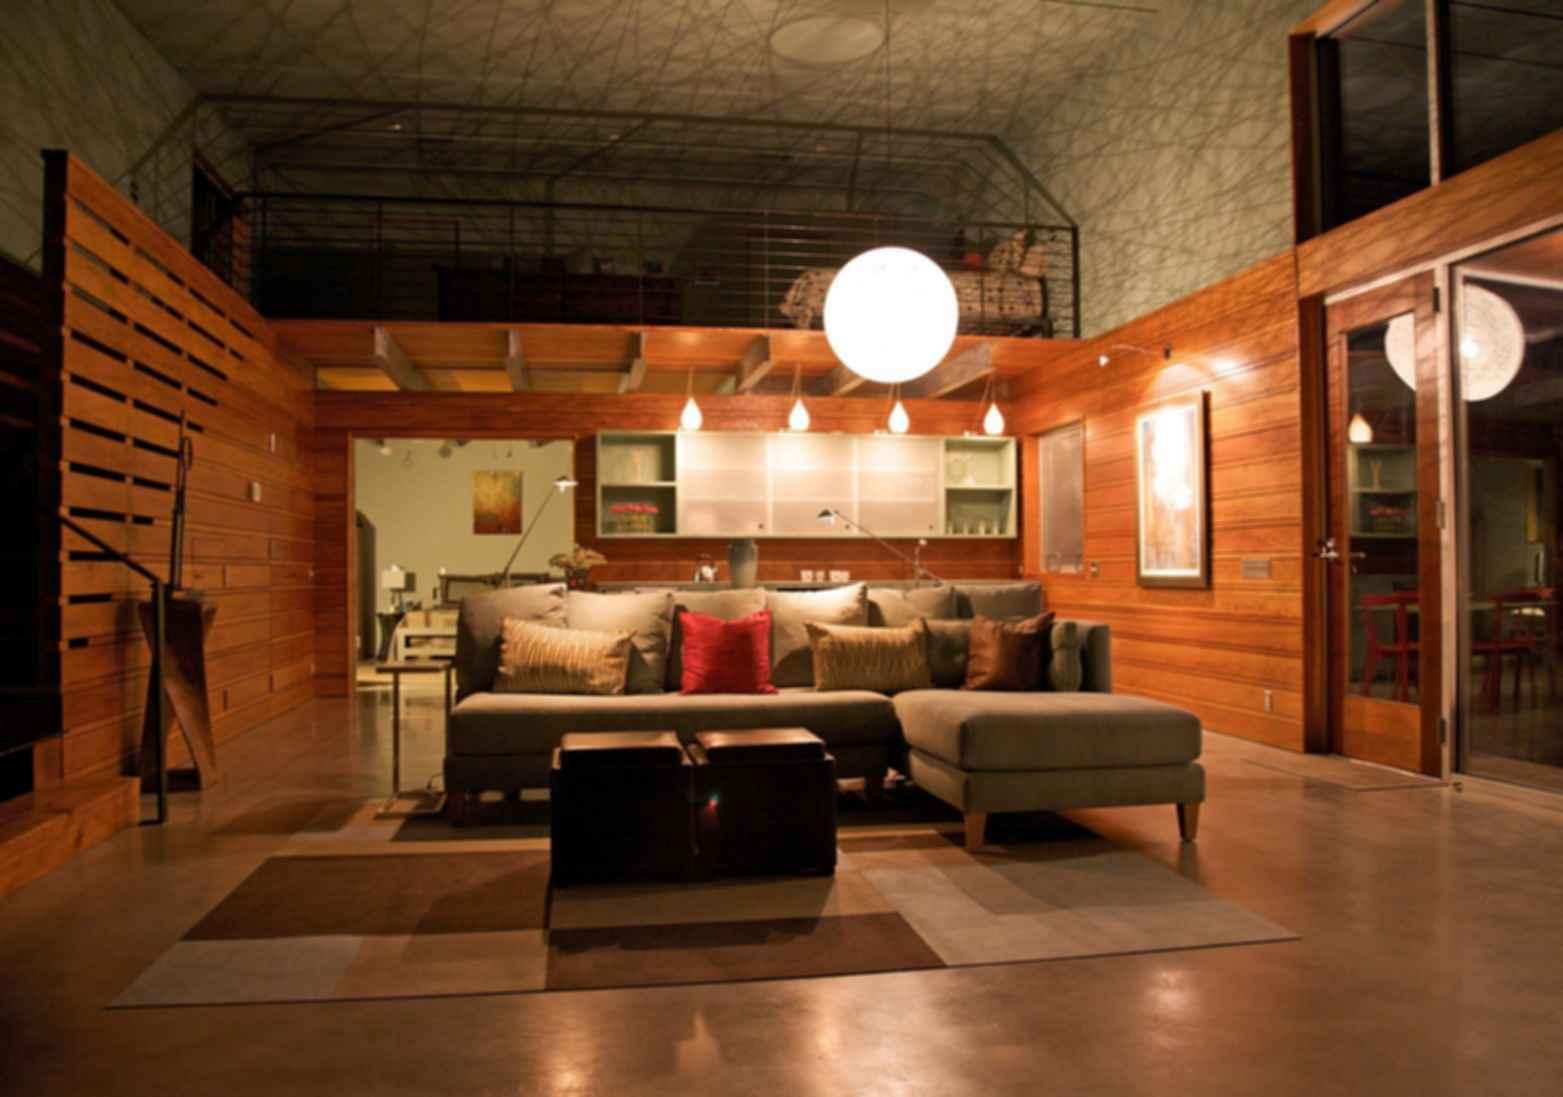 Mod Cott - Lounge